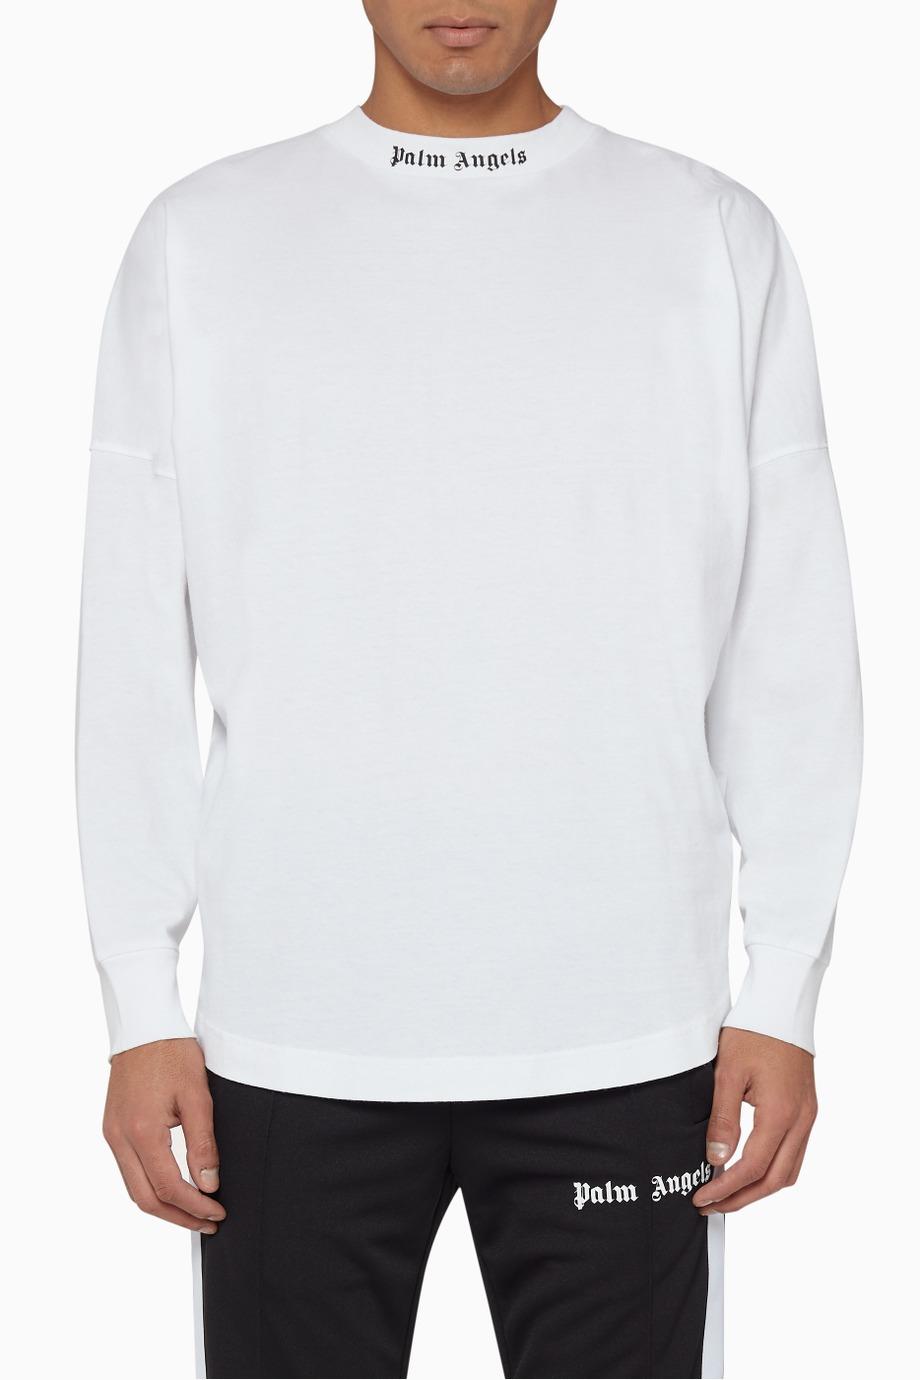 Shop Palm Angels White Oversized Classic Logo Print T Shirt For Men Ounass Uae Mens Tshirts White Sweatshirt Men Print T Shirt [ 1380 x 920 Pixel ]